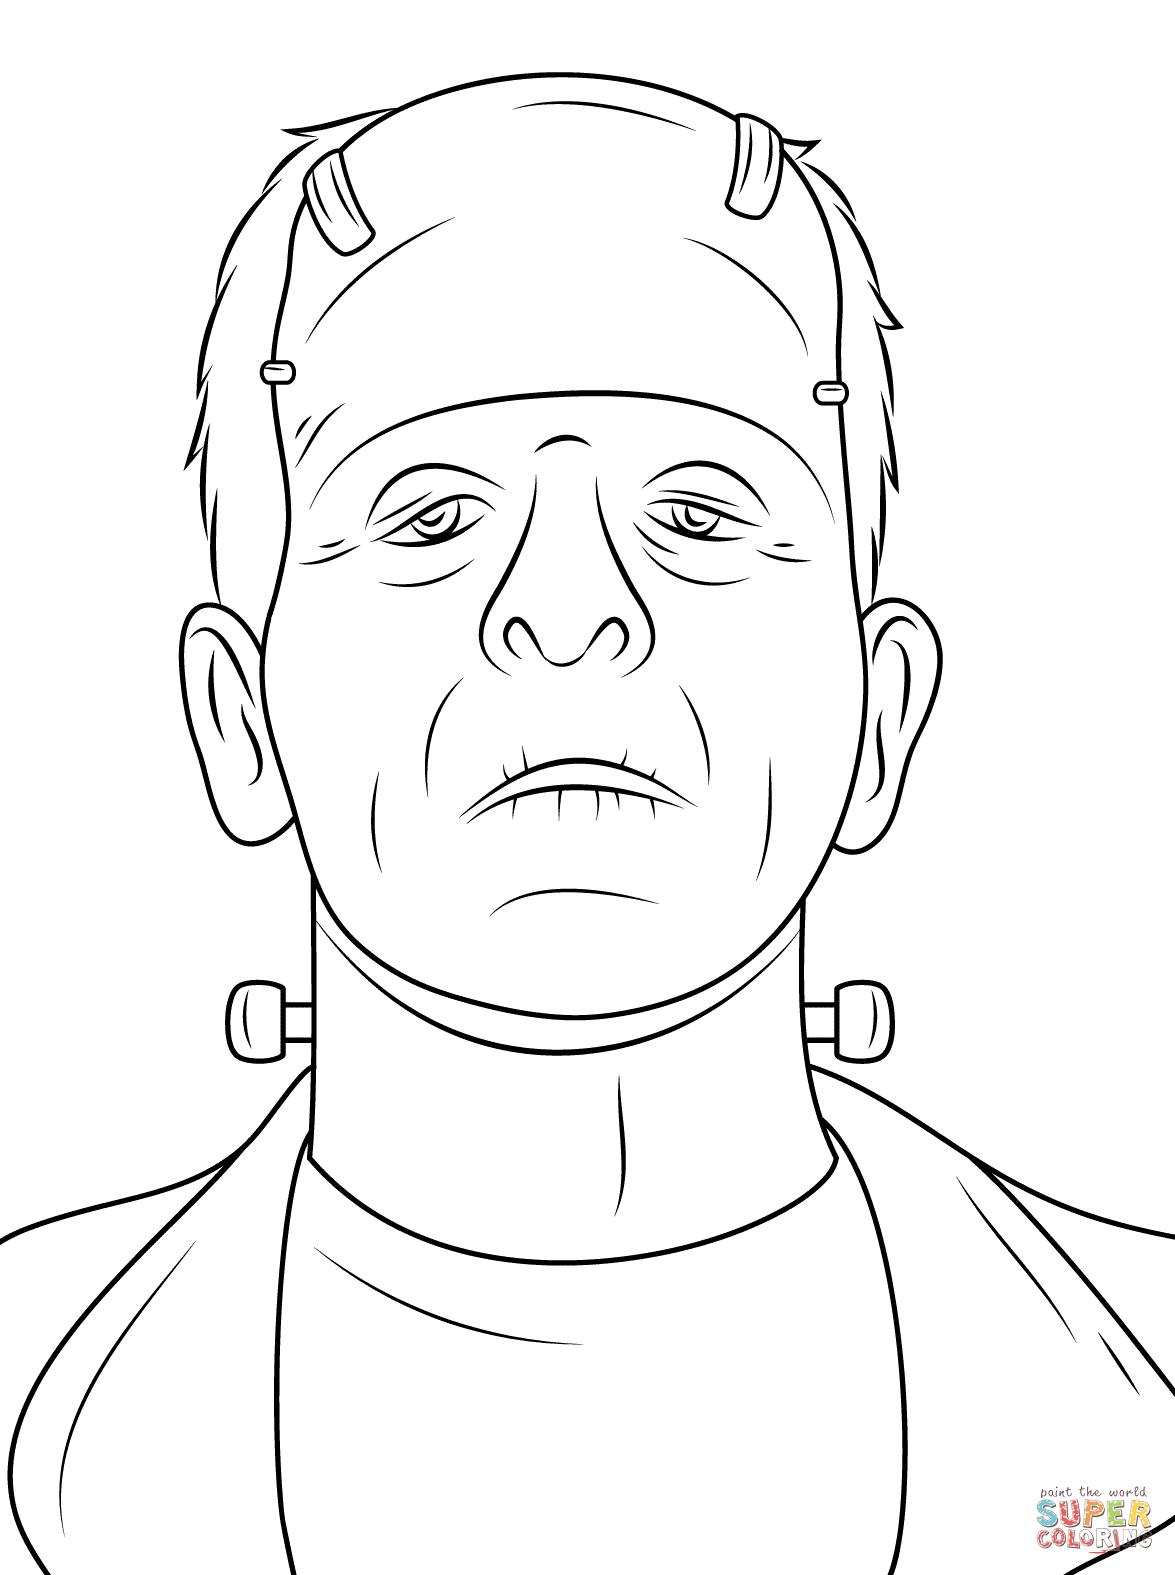 Frankenstein coloring #14, Download drawings